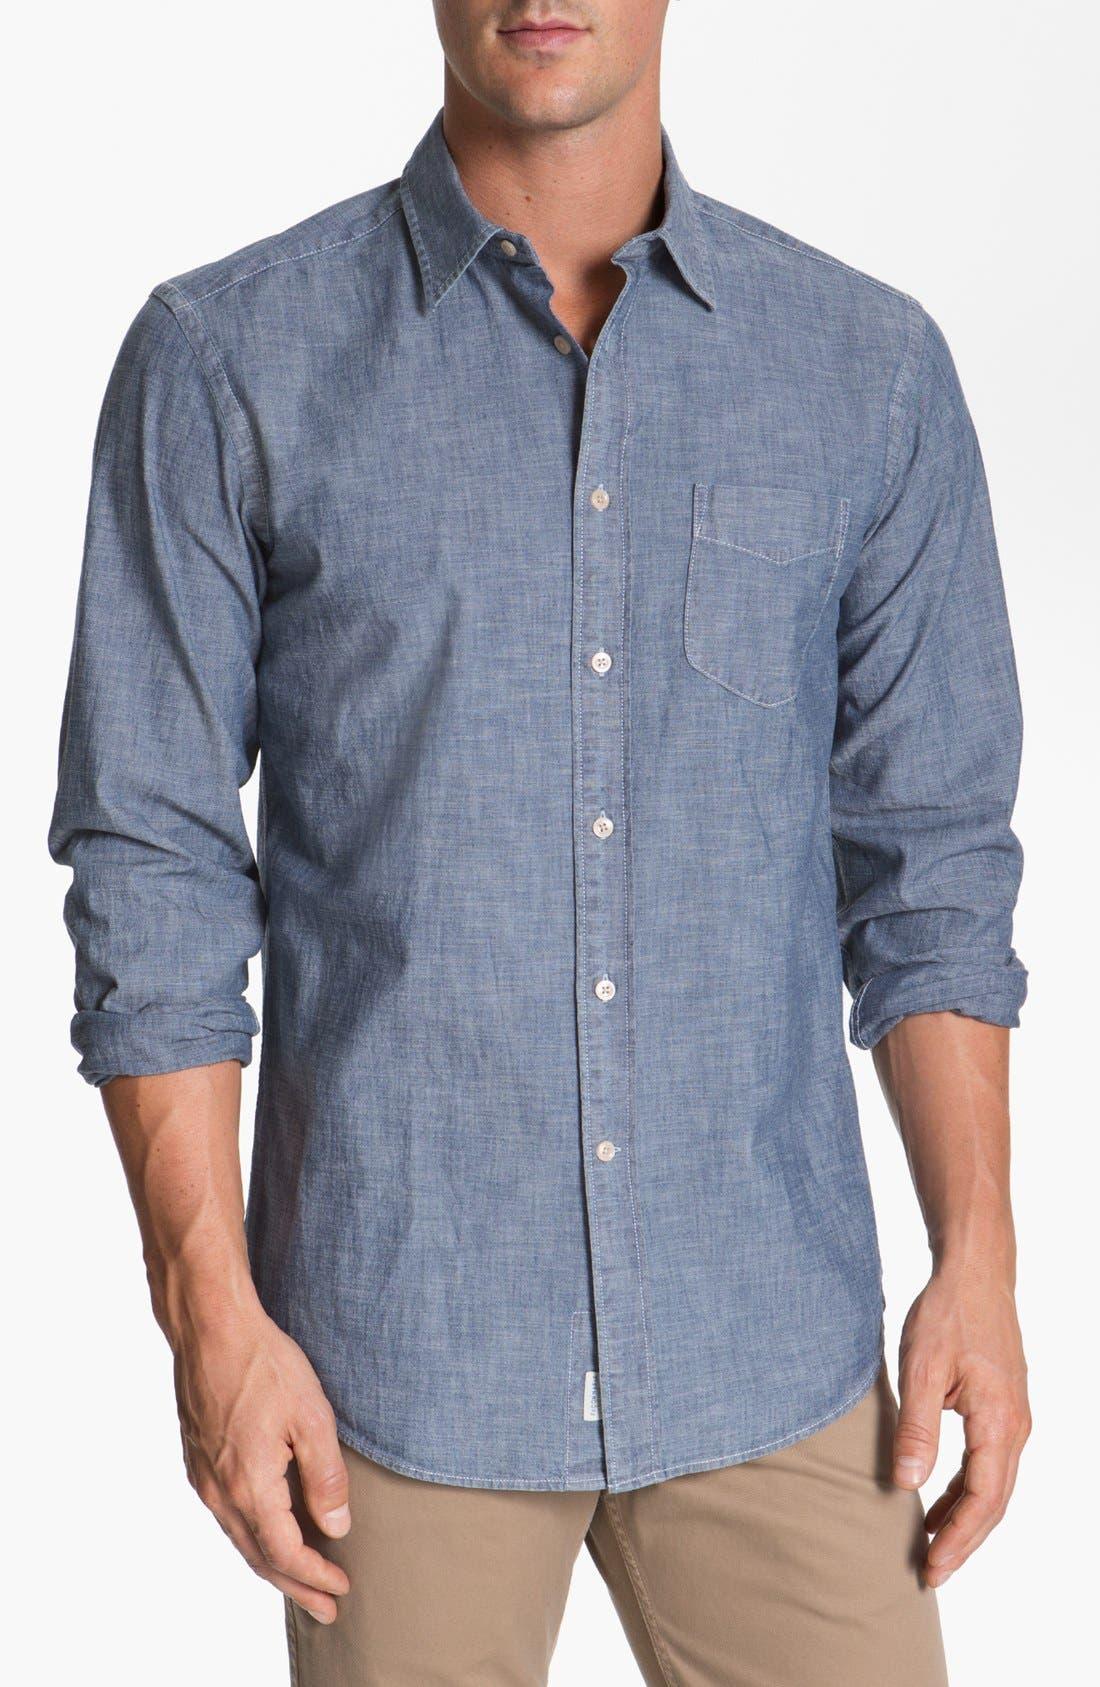 Main Image - Façonnable Tailored Denim Regular Fit Chambray Sport Shirt